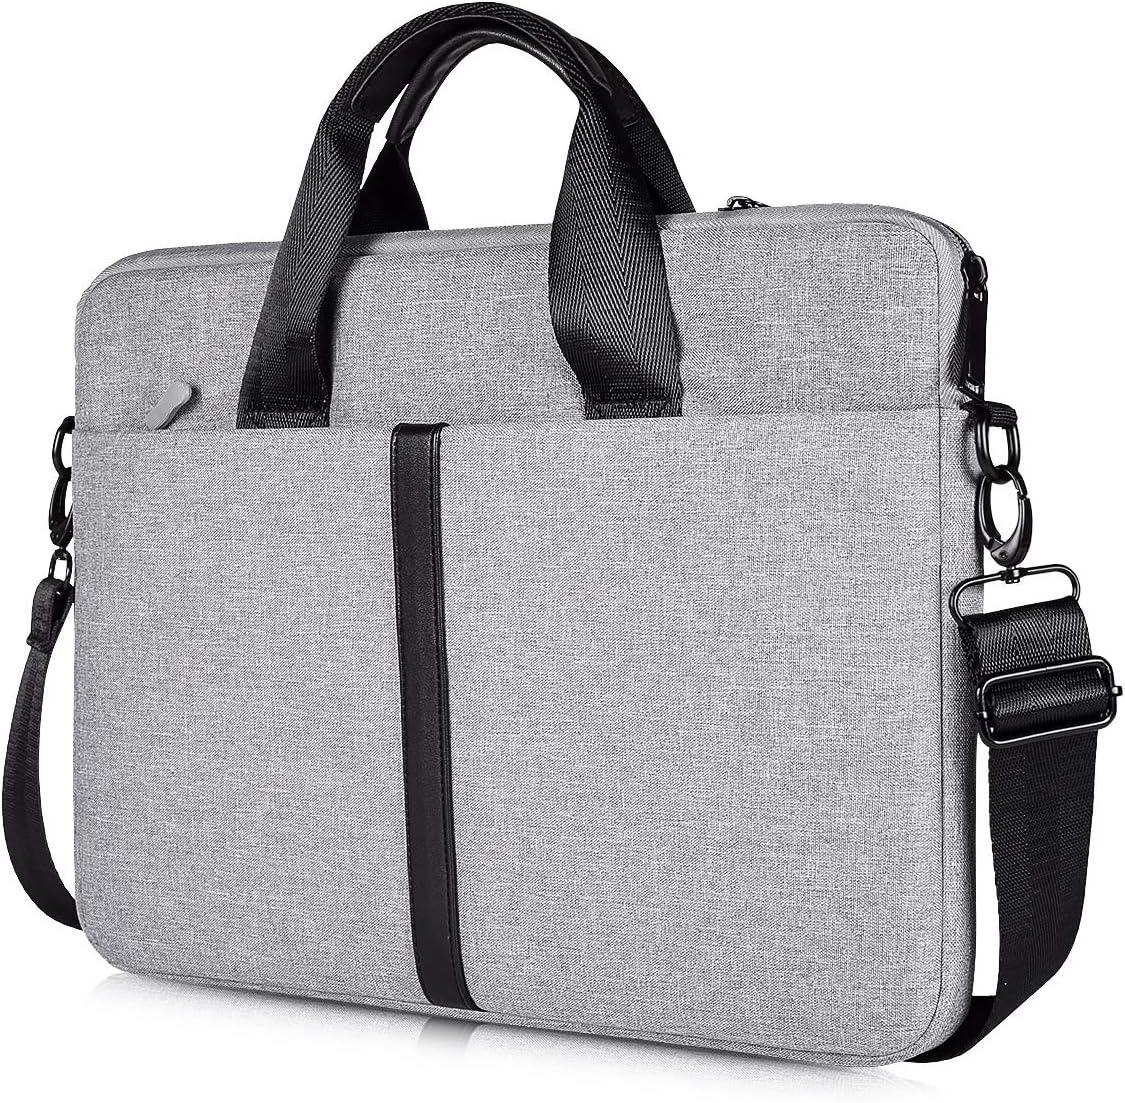 CaseBuy 15.6 Inch Premium Laptop Shoulder Bag, Waterproof Laptop Sleeve Case for HP Spectre X360 15.6/ENVY X360 15.6, Acer Aspire, ASUS VivoBook, Dell Inspiron 15, MSI GL62M, 15.6 Slim Laptop Bag,Grey